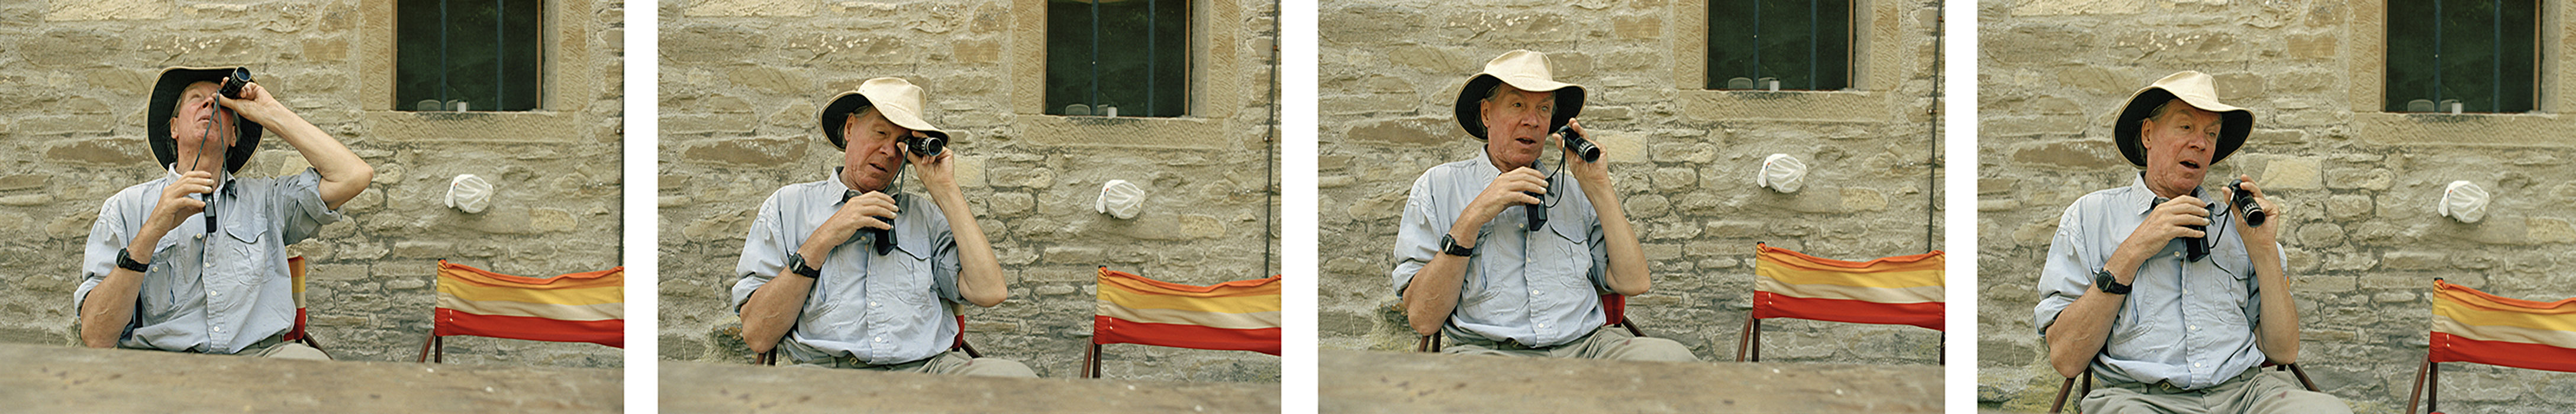 Sargy Mann in Borgo Pace, Italy